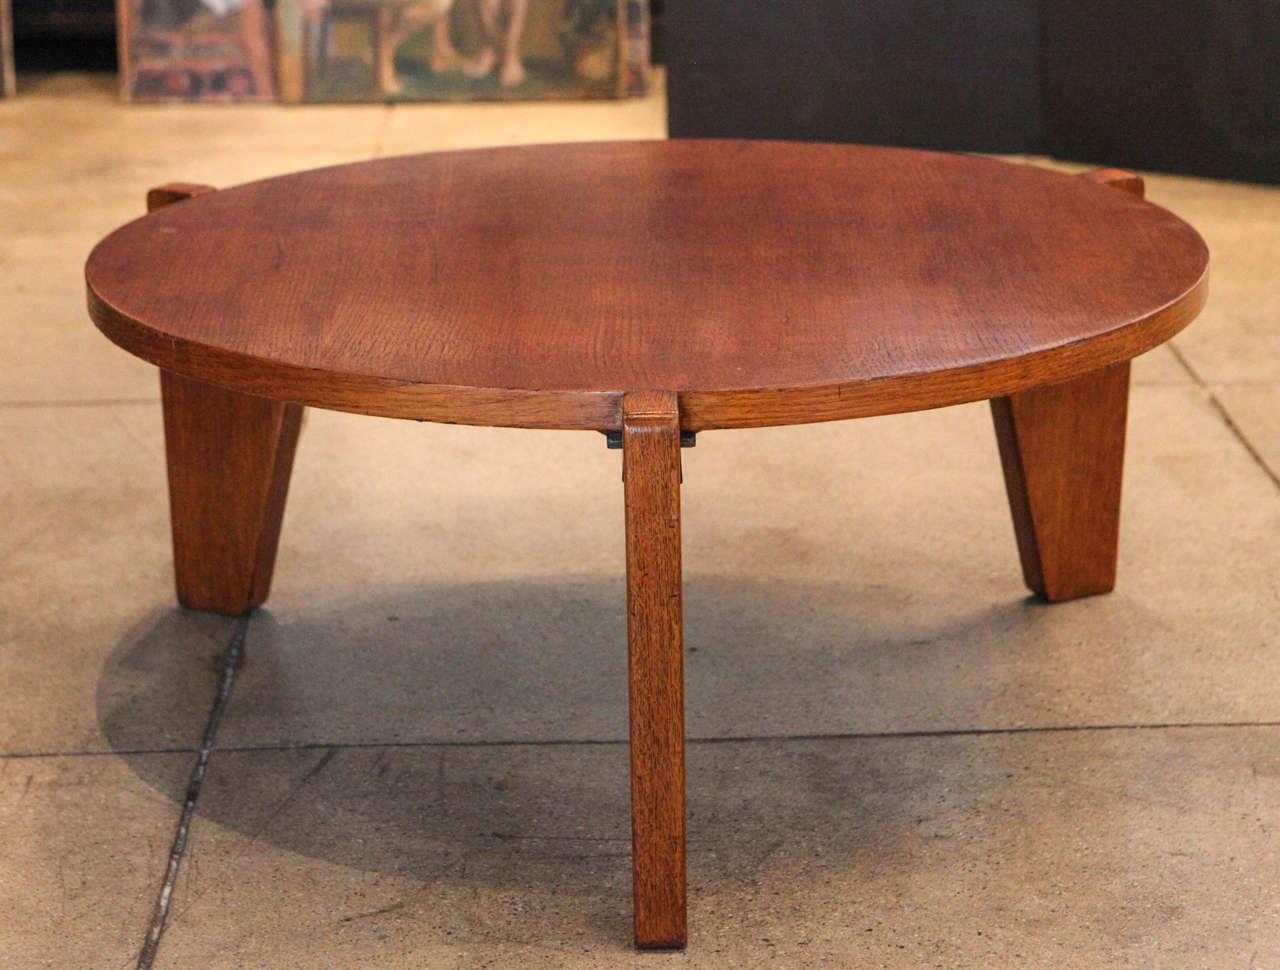 Jean prouve gueridon bas coffee table ateliers jean prouve at 1stdibs - Jean prouve coffee table ...